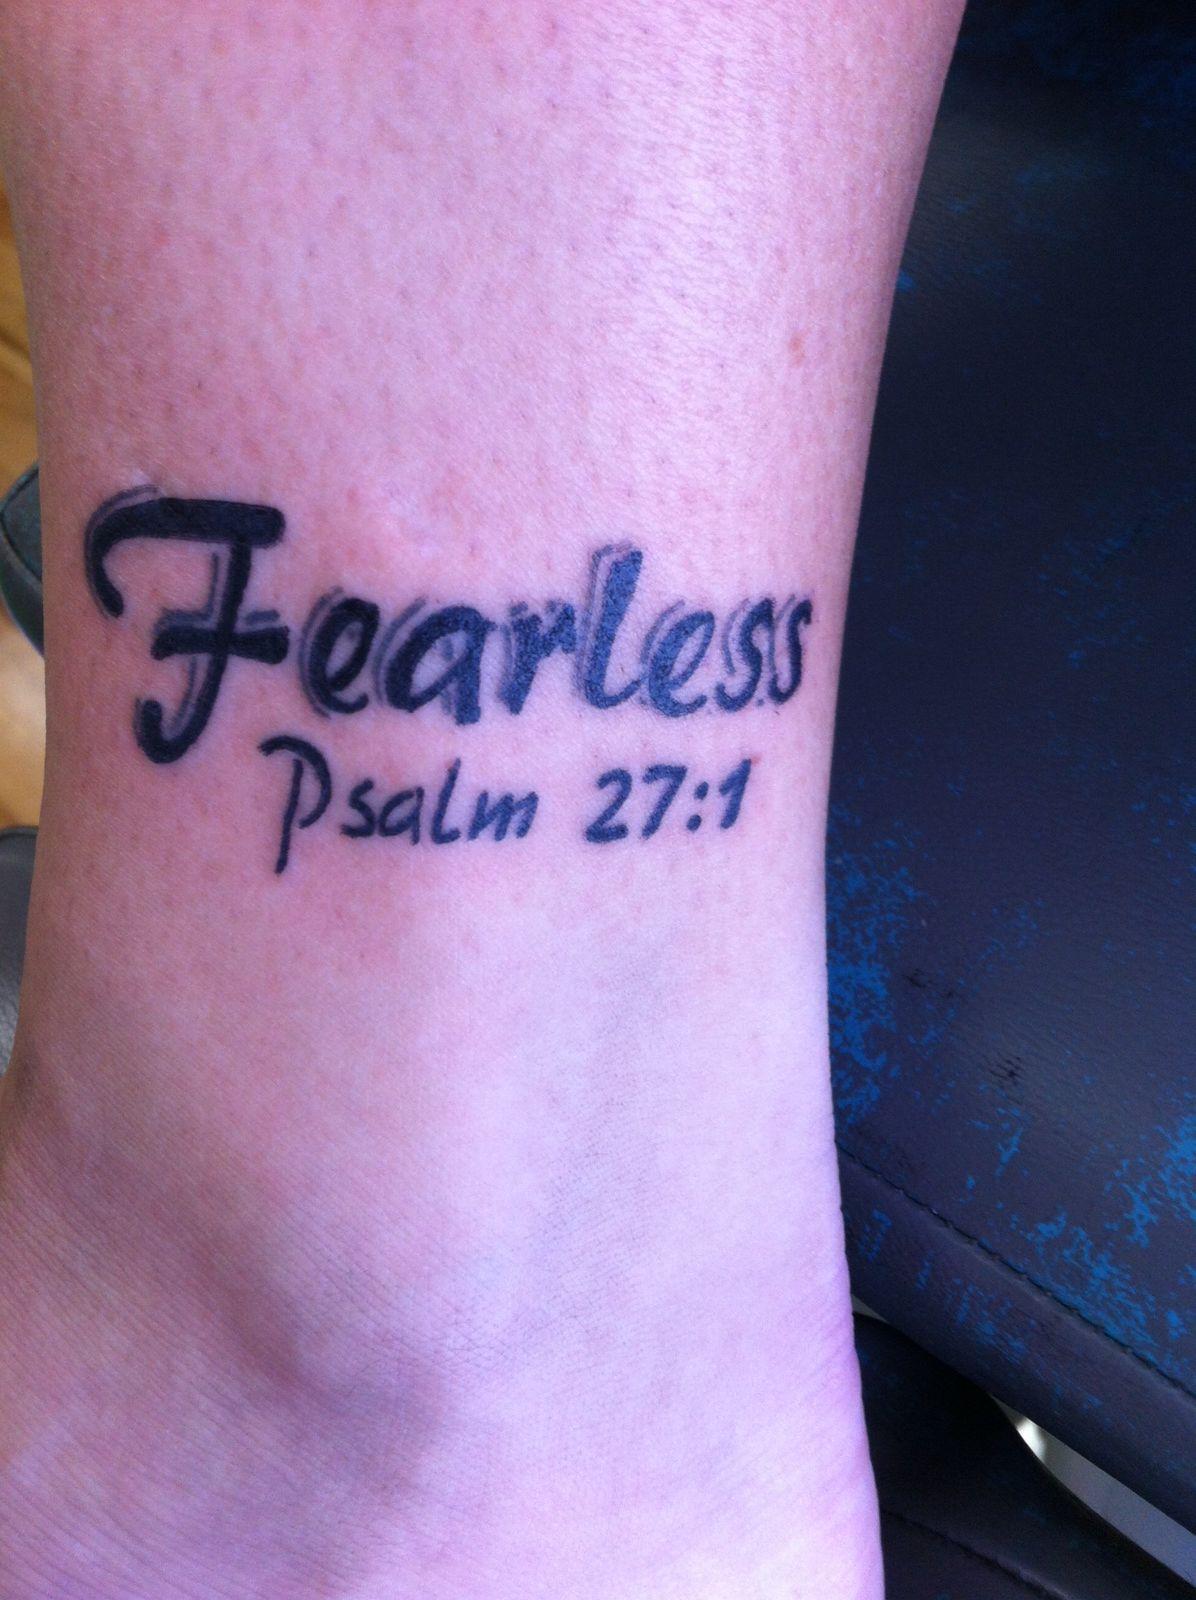 My Newest Tattoo Fearless Psalm 27 1 Designed It Myself Tattoos For Guys Tattoos Cute Tattoos